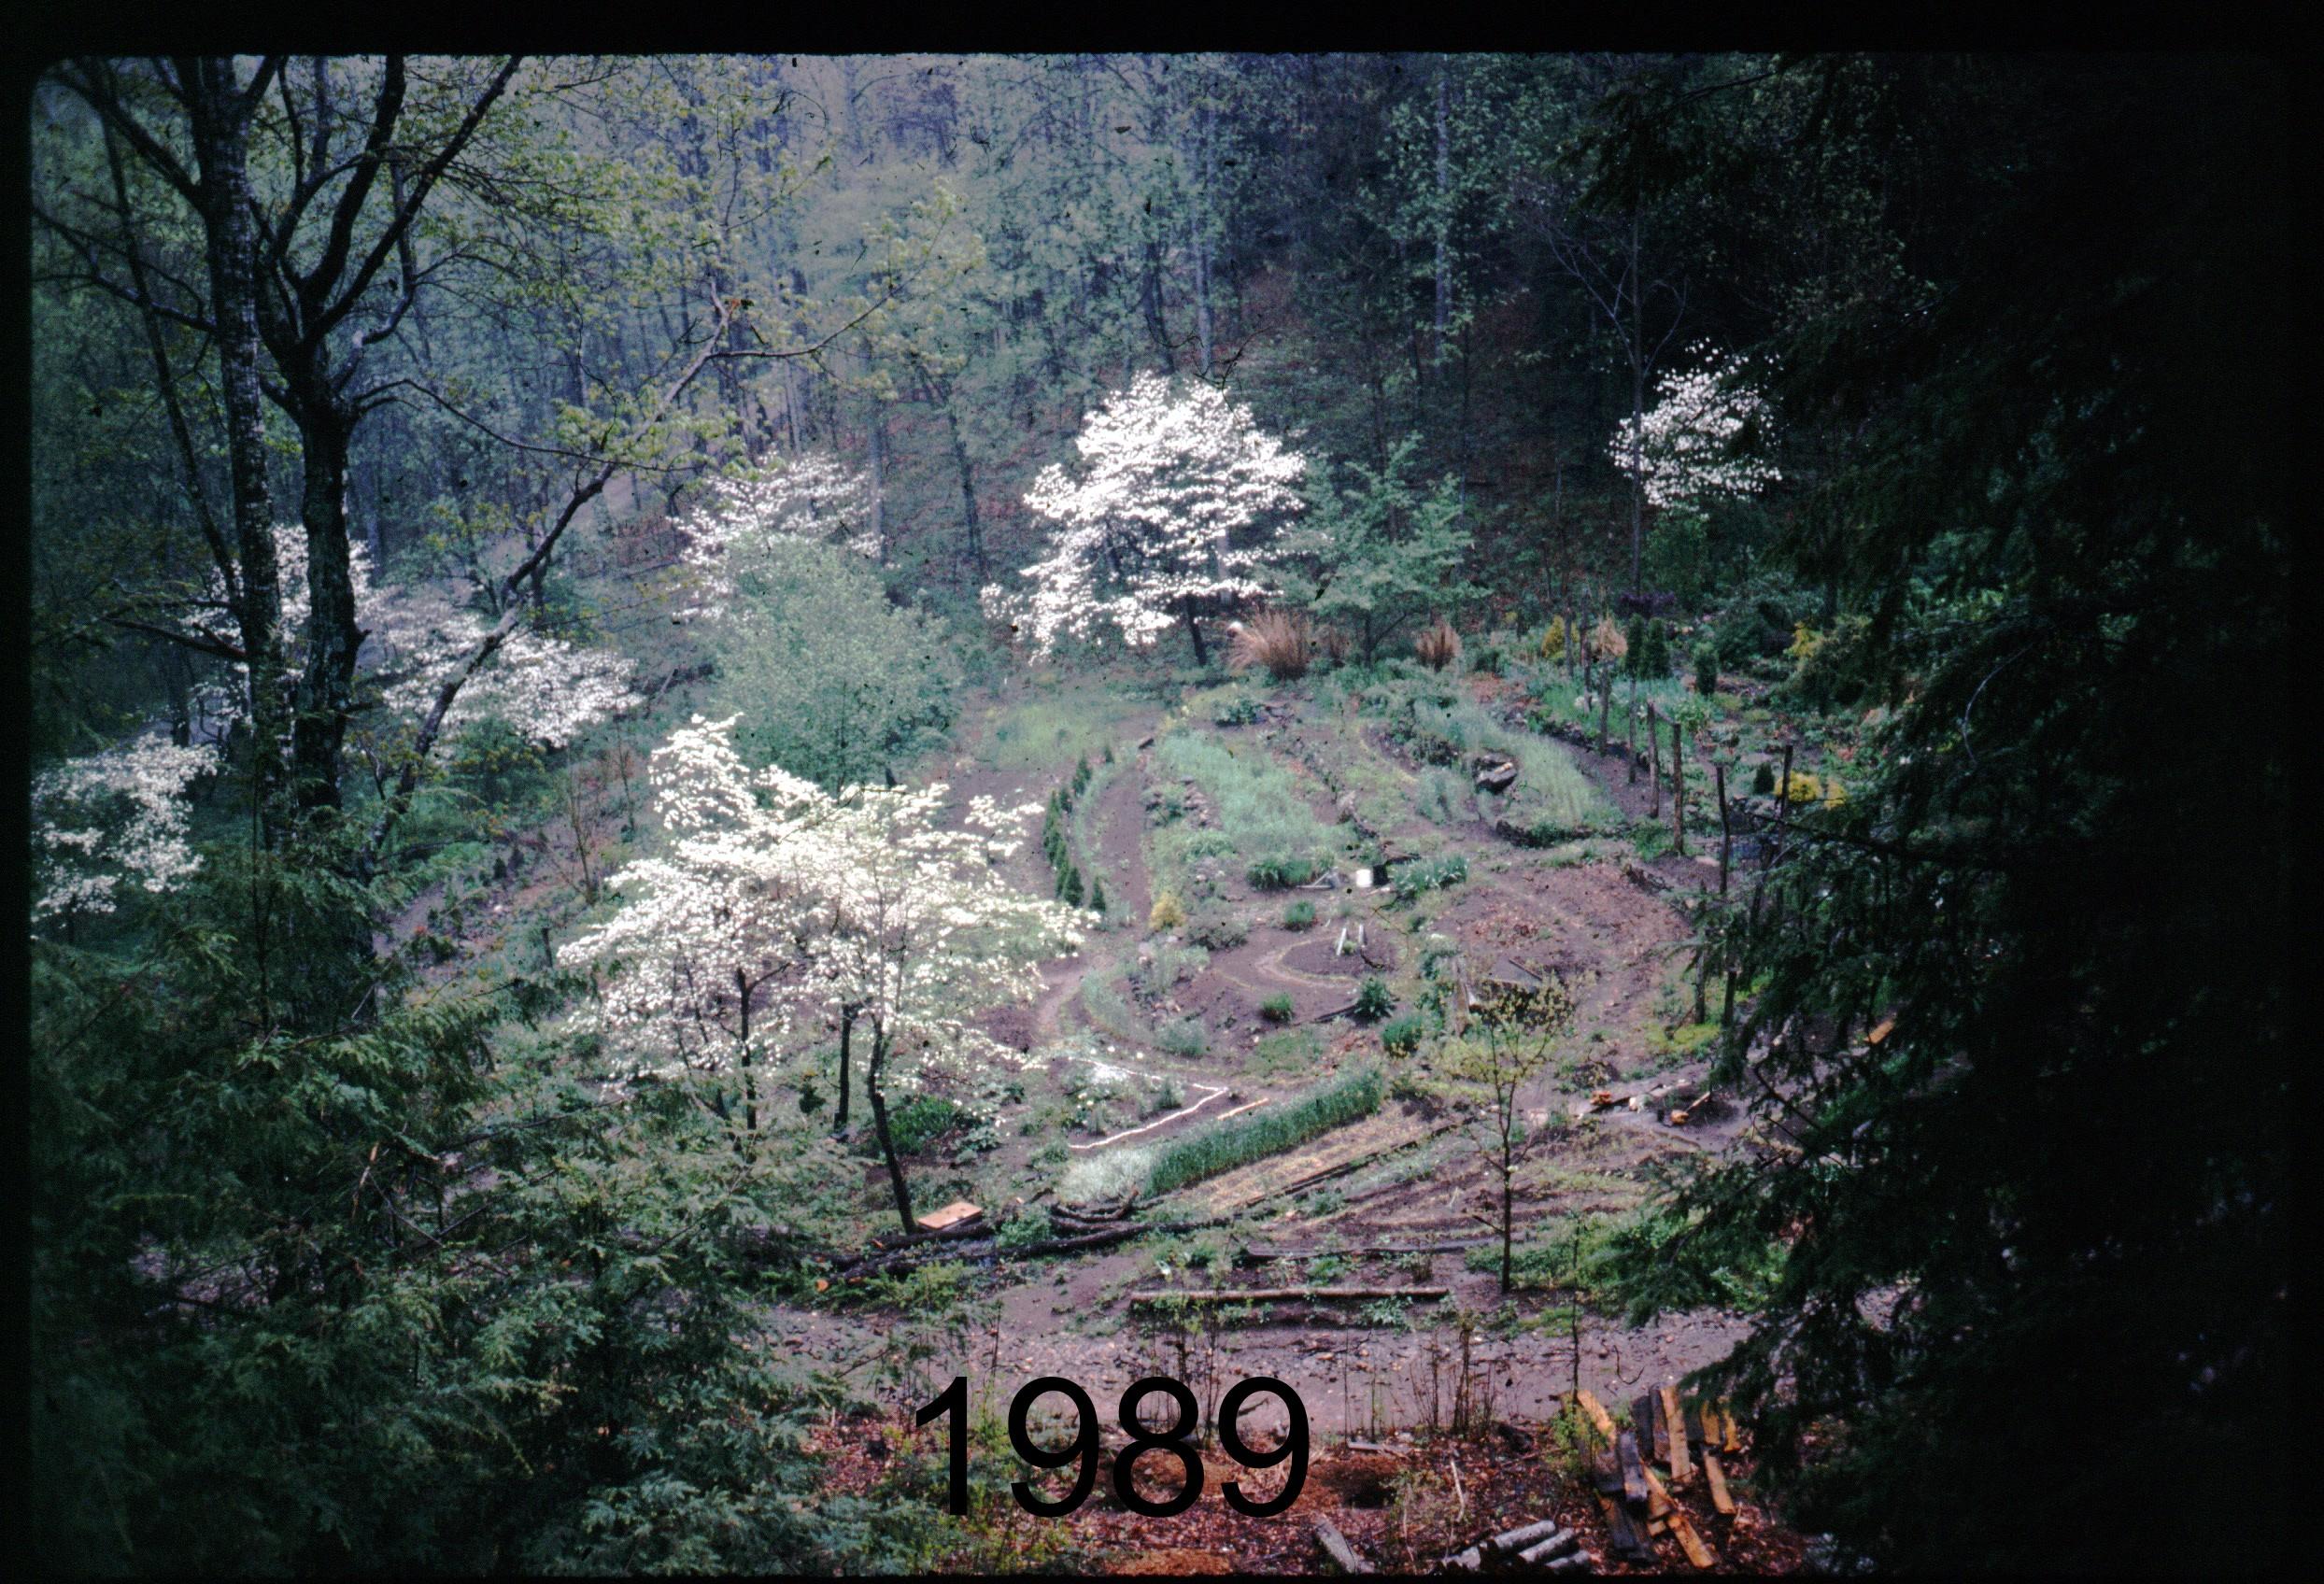 1989 house - gdn, dogwoods.jpg